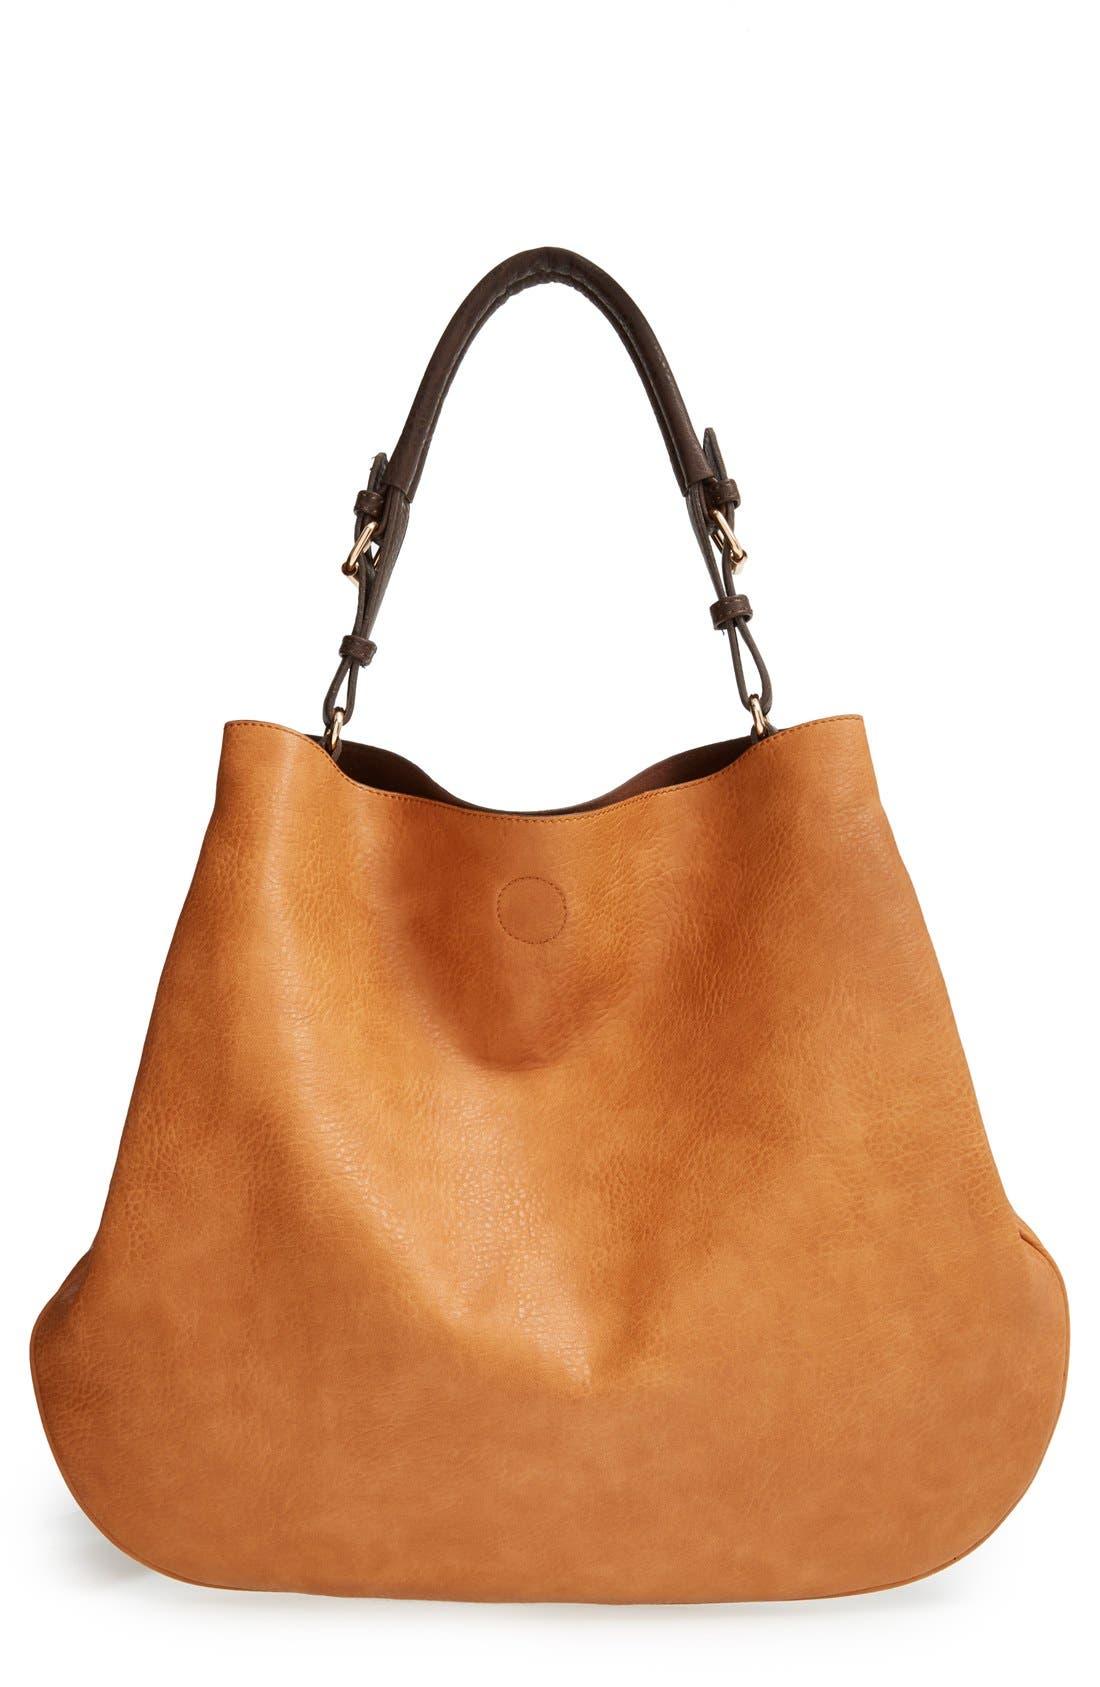 Main Image - Sole Society 'Capri' Faux Leather Tote